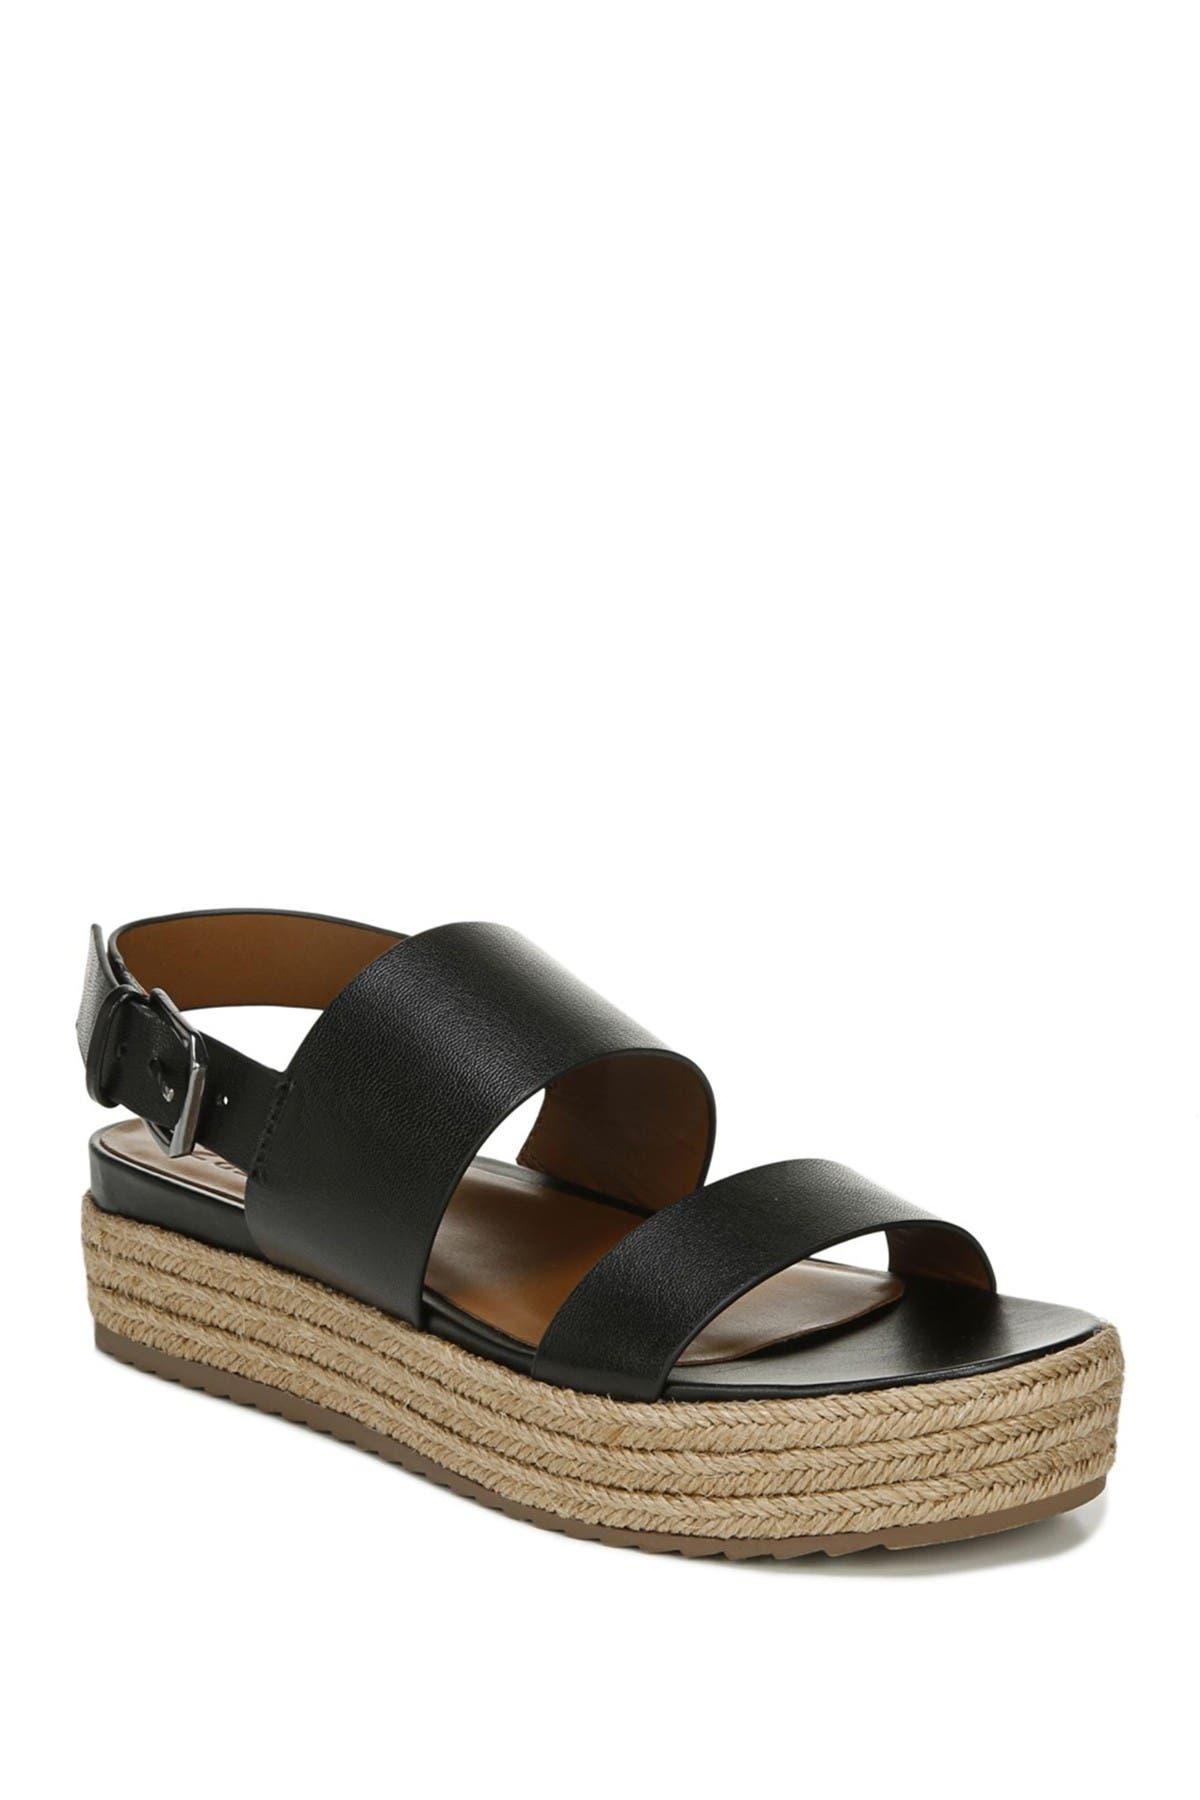 Naturalizer | Patience Woven Sandal